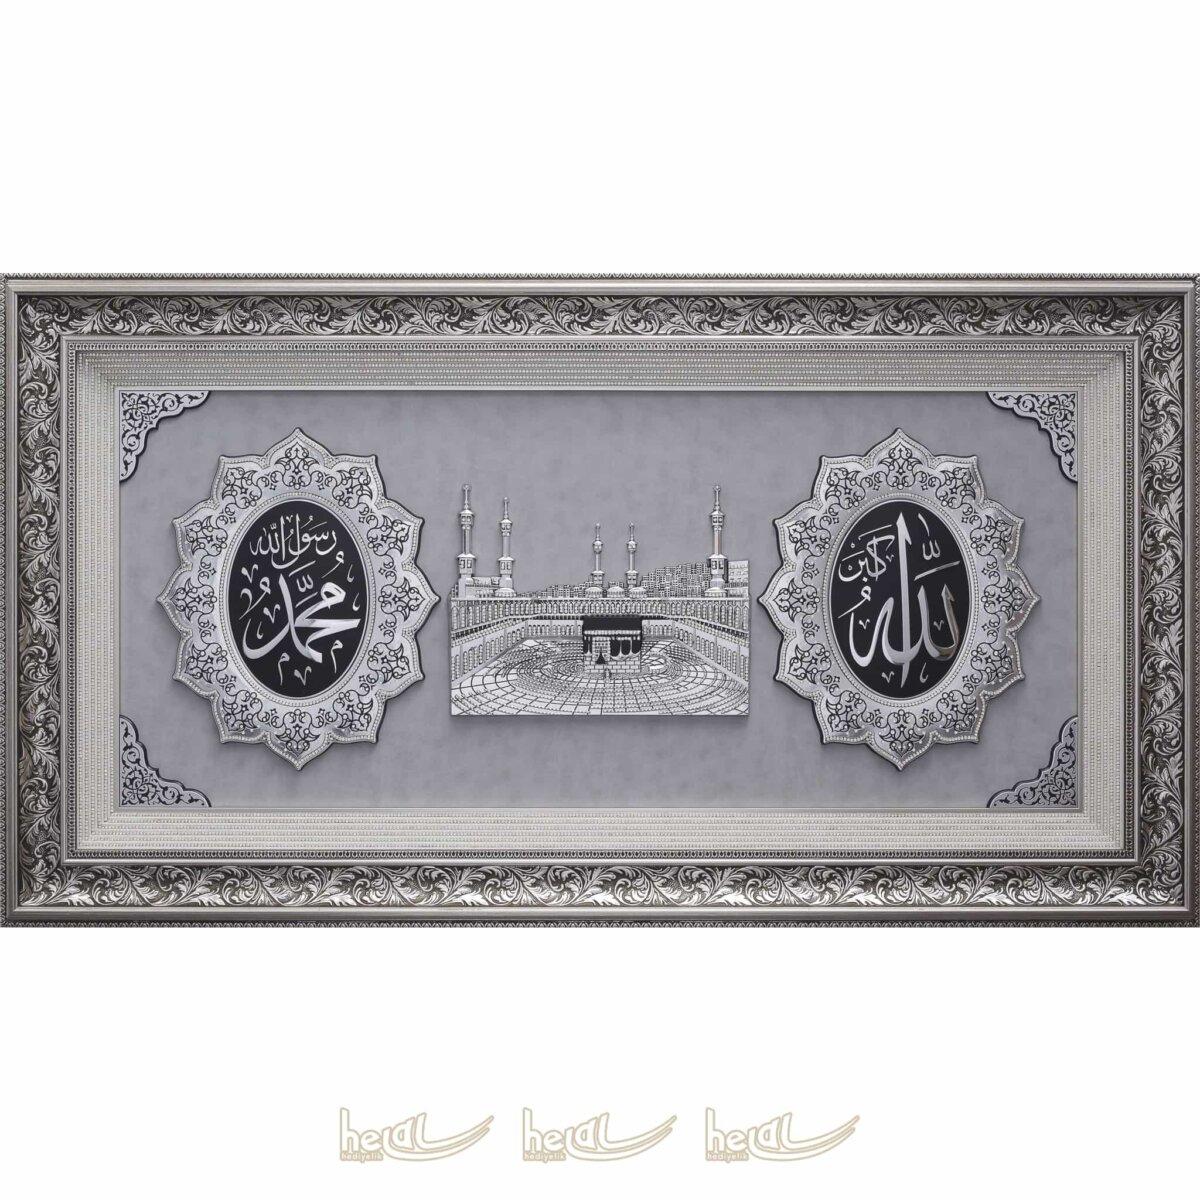 80x150cm Dev Boyda Kabe-i Şerif Allah cc. Muhammed sav. Paspartusu Taşlı Lüks Camlı Çerçeveli Tablo Kabe